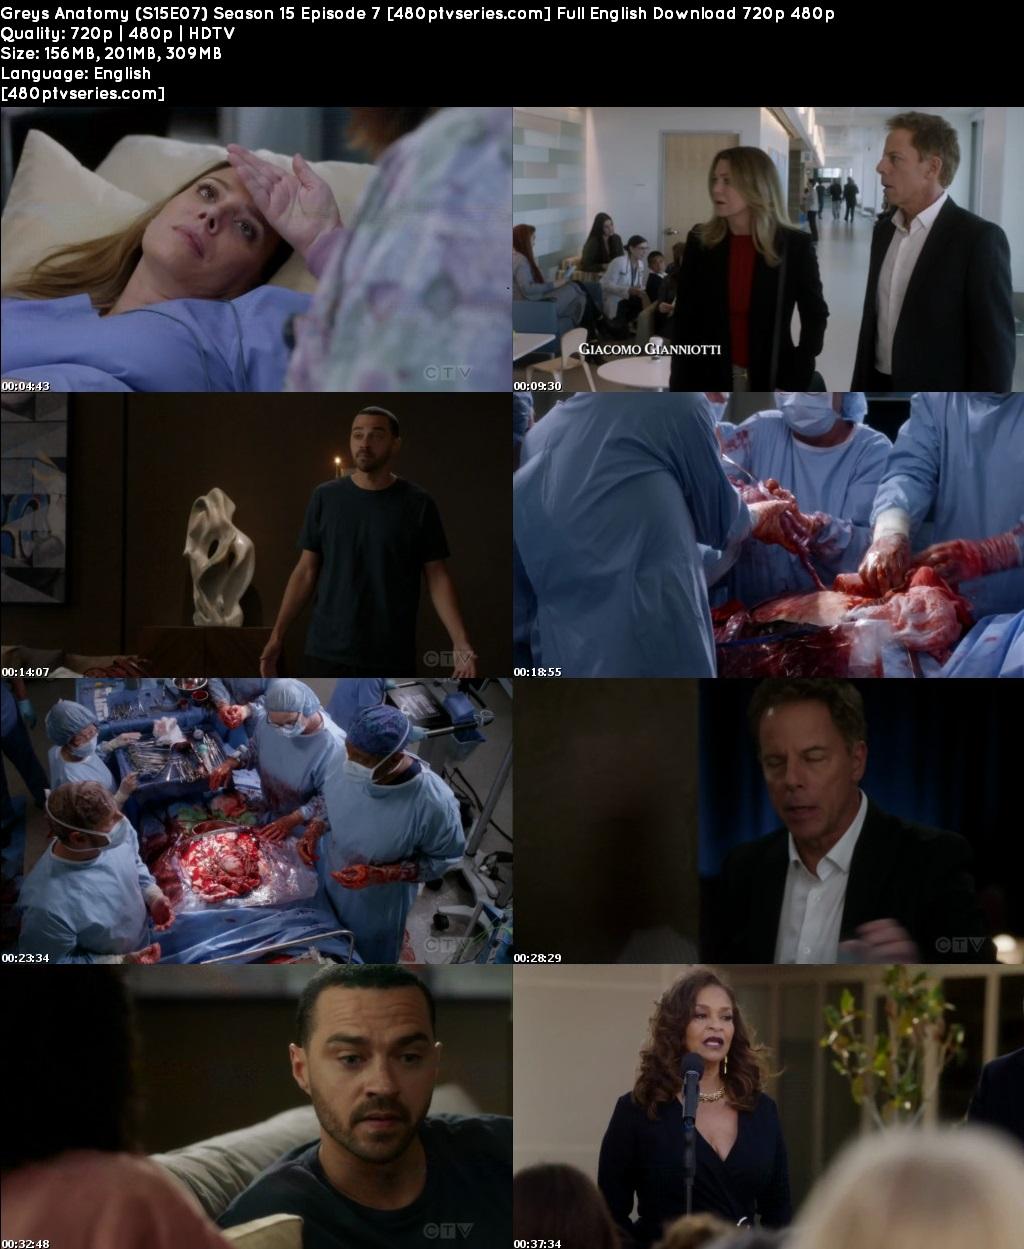 Greys Anatomy (S15E07) Season 15 Episode 7 Full English Download 720p 480p